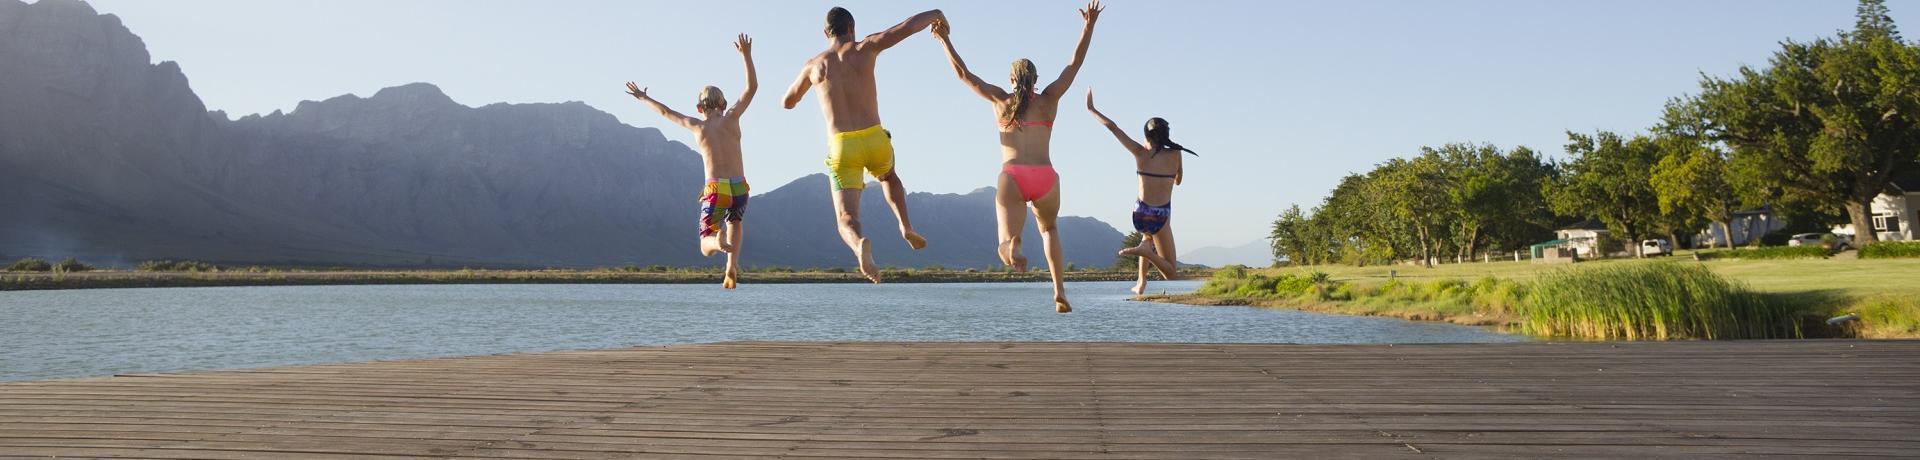 Urlaub: Familie - Emotion